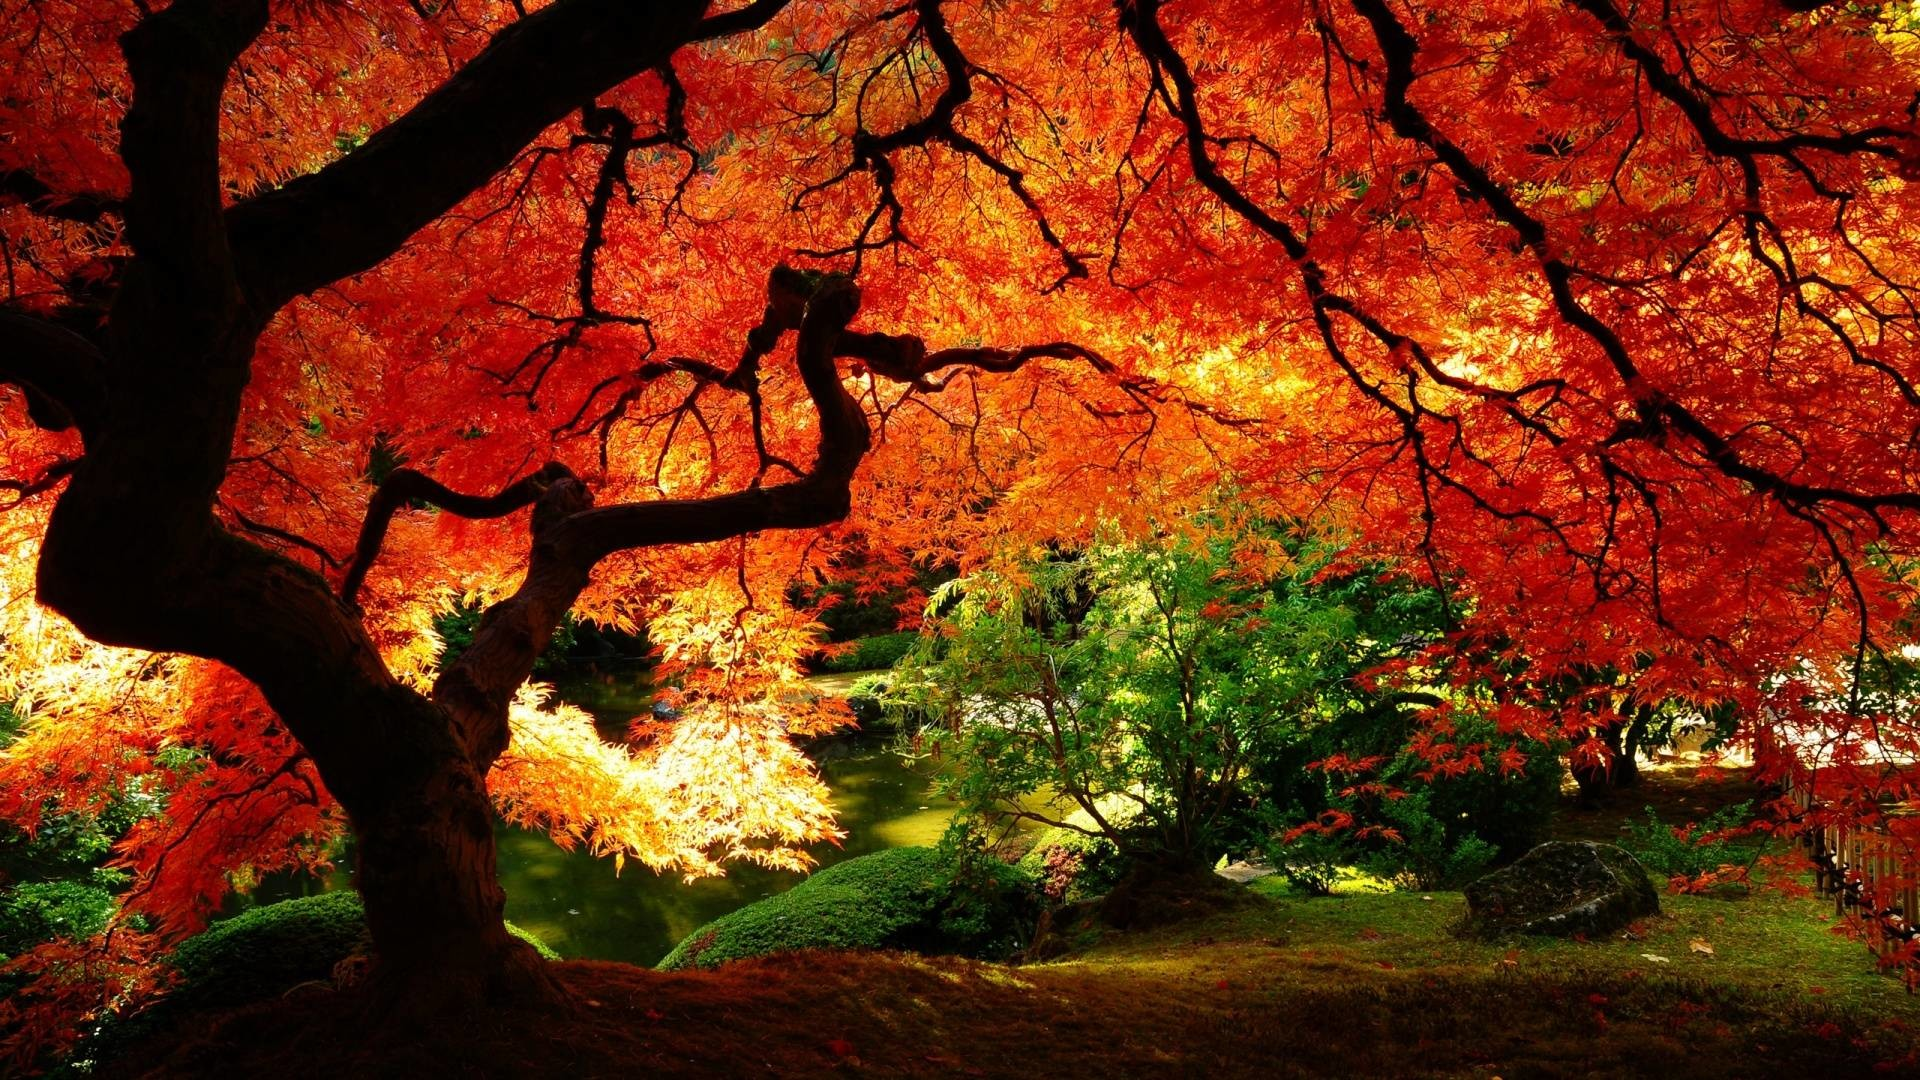 Autumn Computer Wallpapers, Desktop Backgrounds Id: 292378